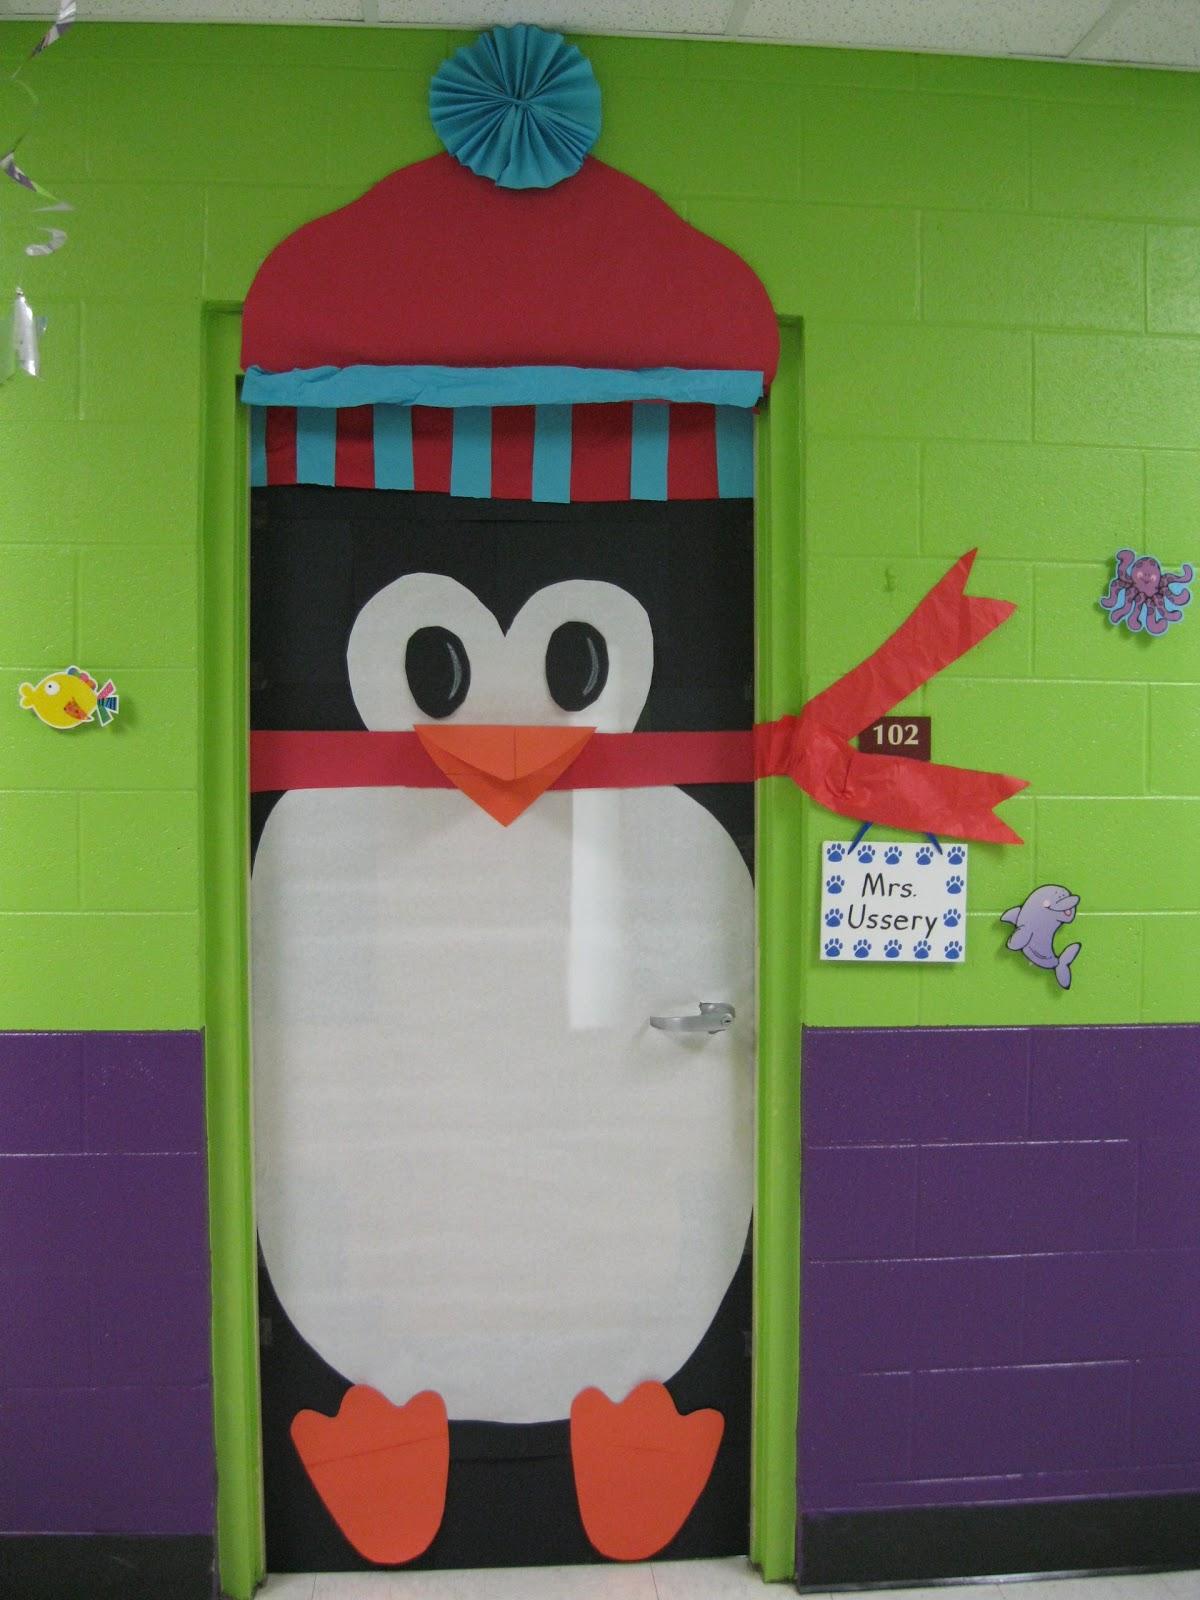 Mrs. Ussery's Second Grade Class: Our Door